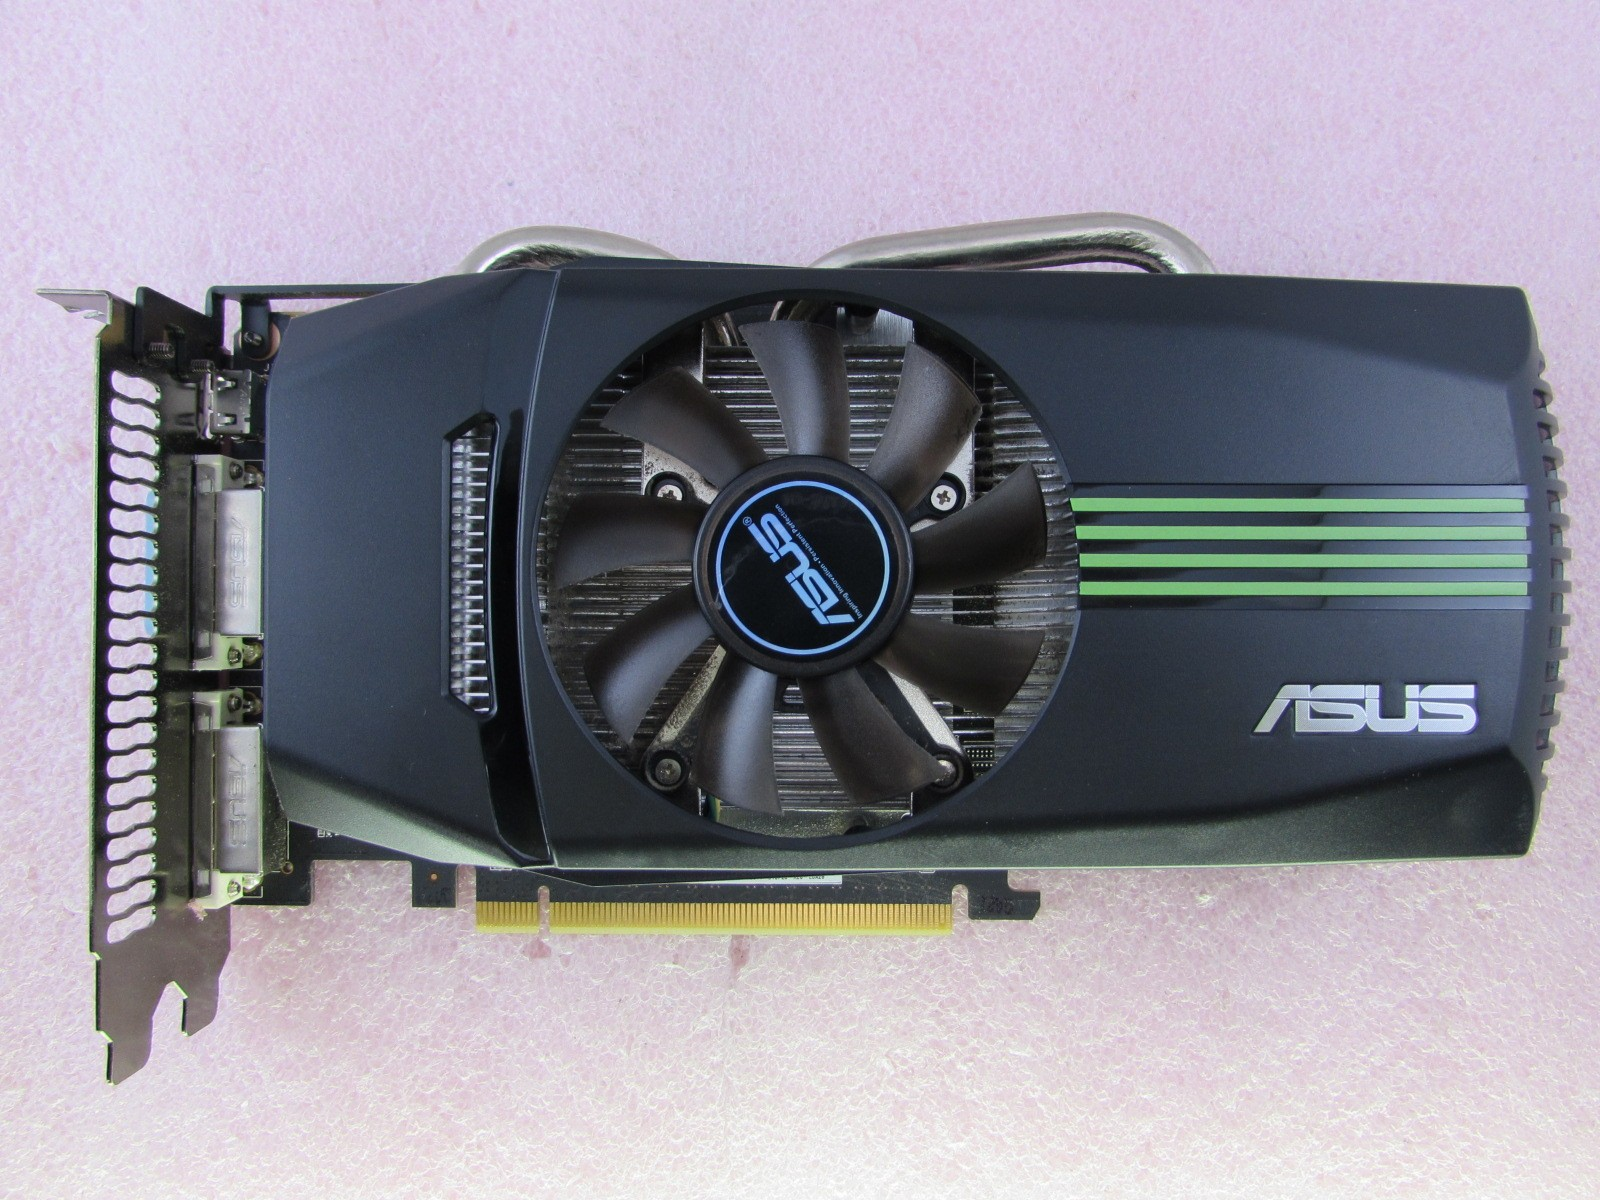 Asus Geforce Gtx 460 Driver Download